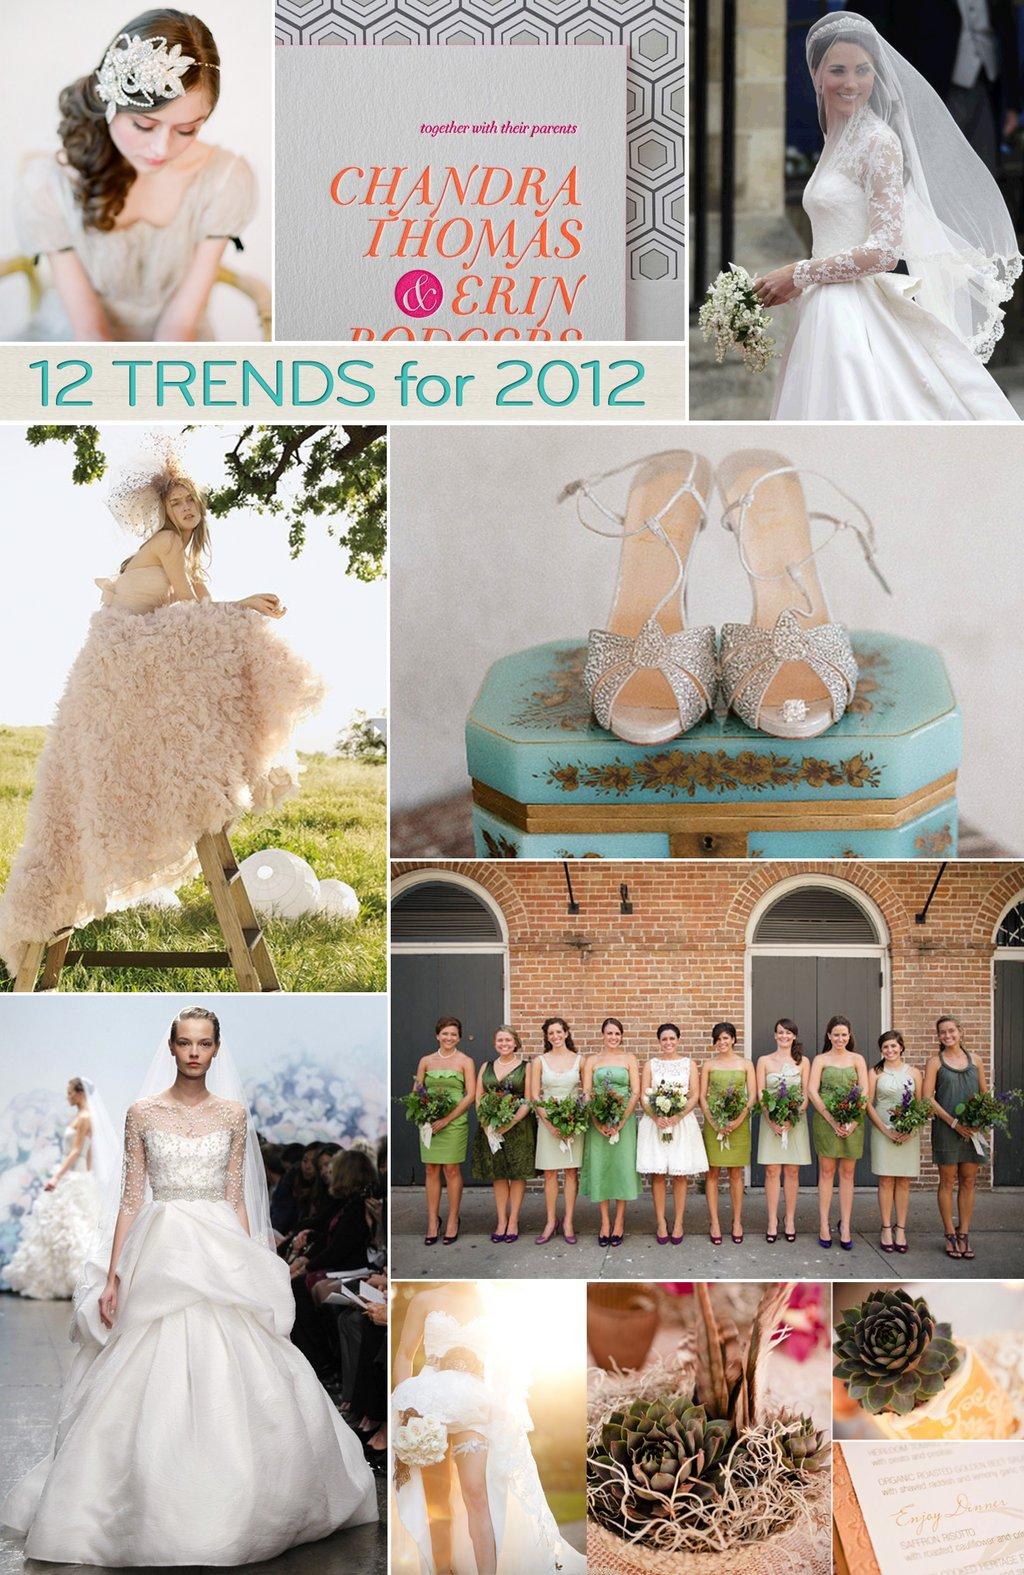 Top-12-wedding-trends-2012-weddings-planning-ideas.full